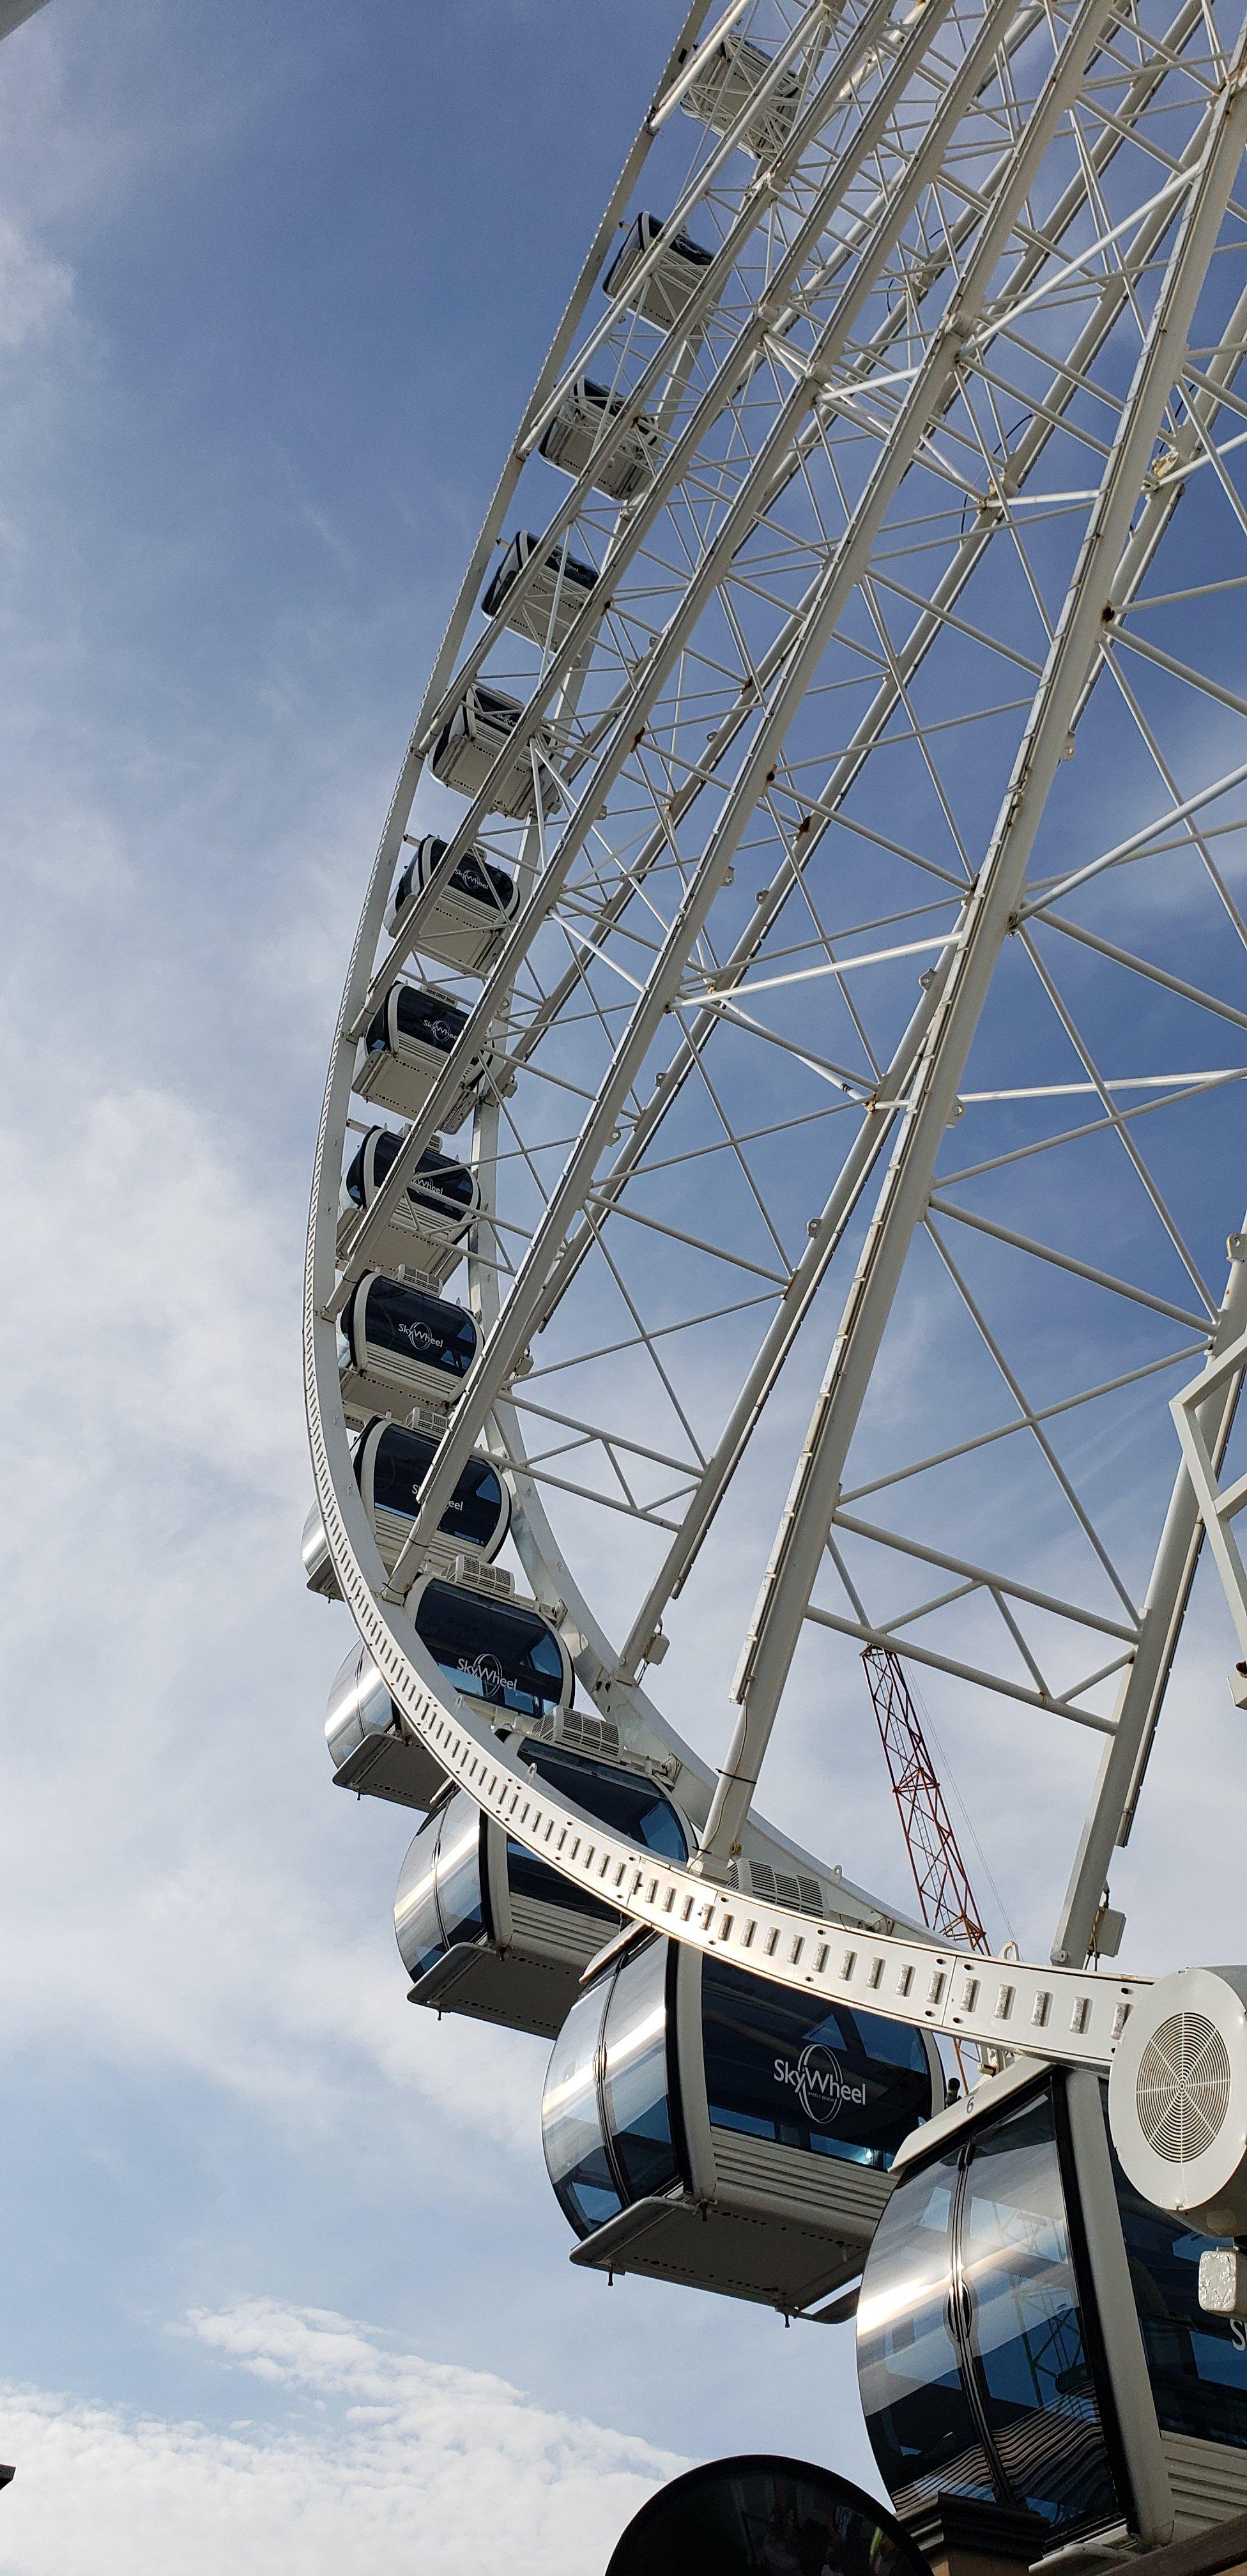 Sky Wheel at Myrtle Beach South Carolina, Summer vacation and seizures